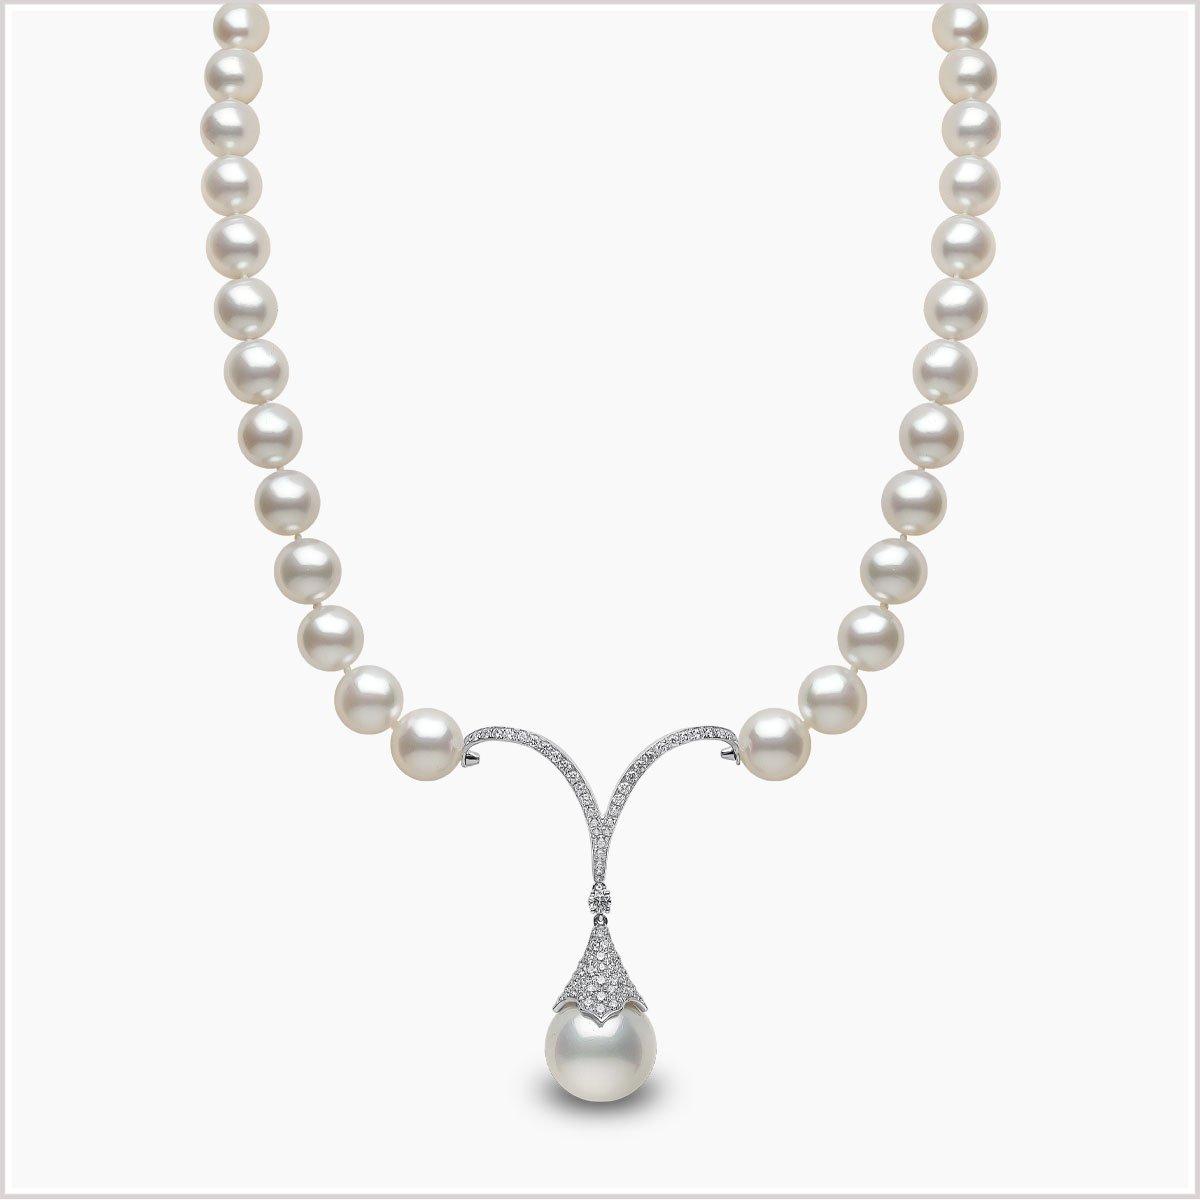 Yoko London Mayfair Diamond and Pearl Necklace